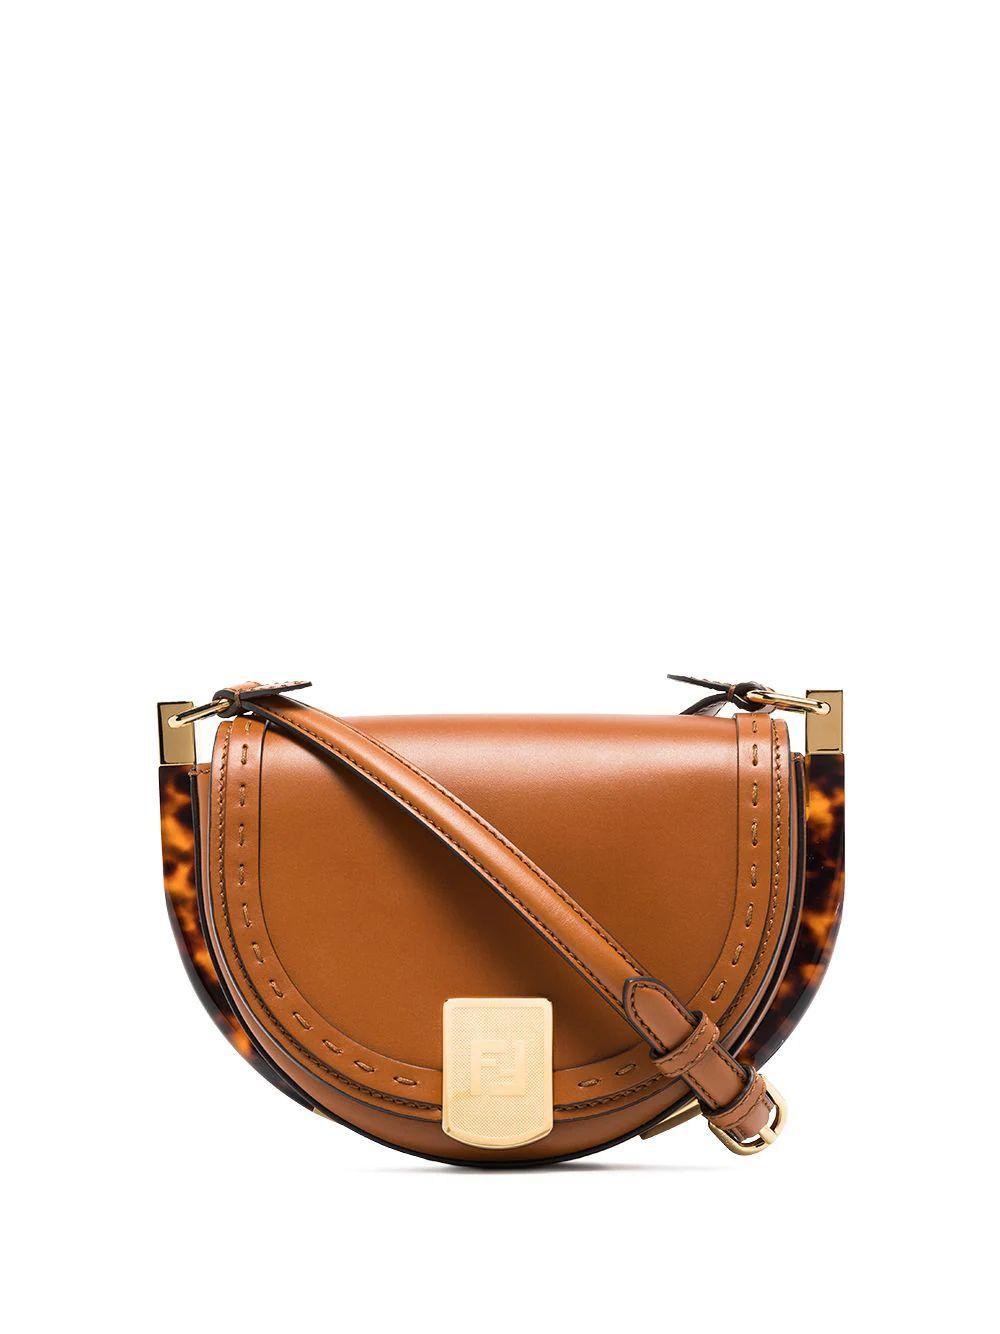 Moonlight Shoulder Bag Item # 8BT346-ABVL